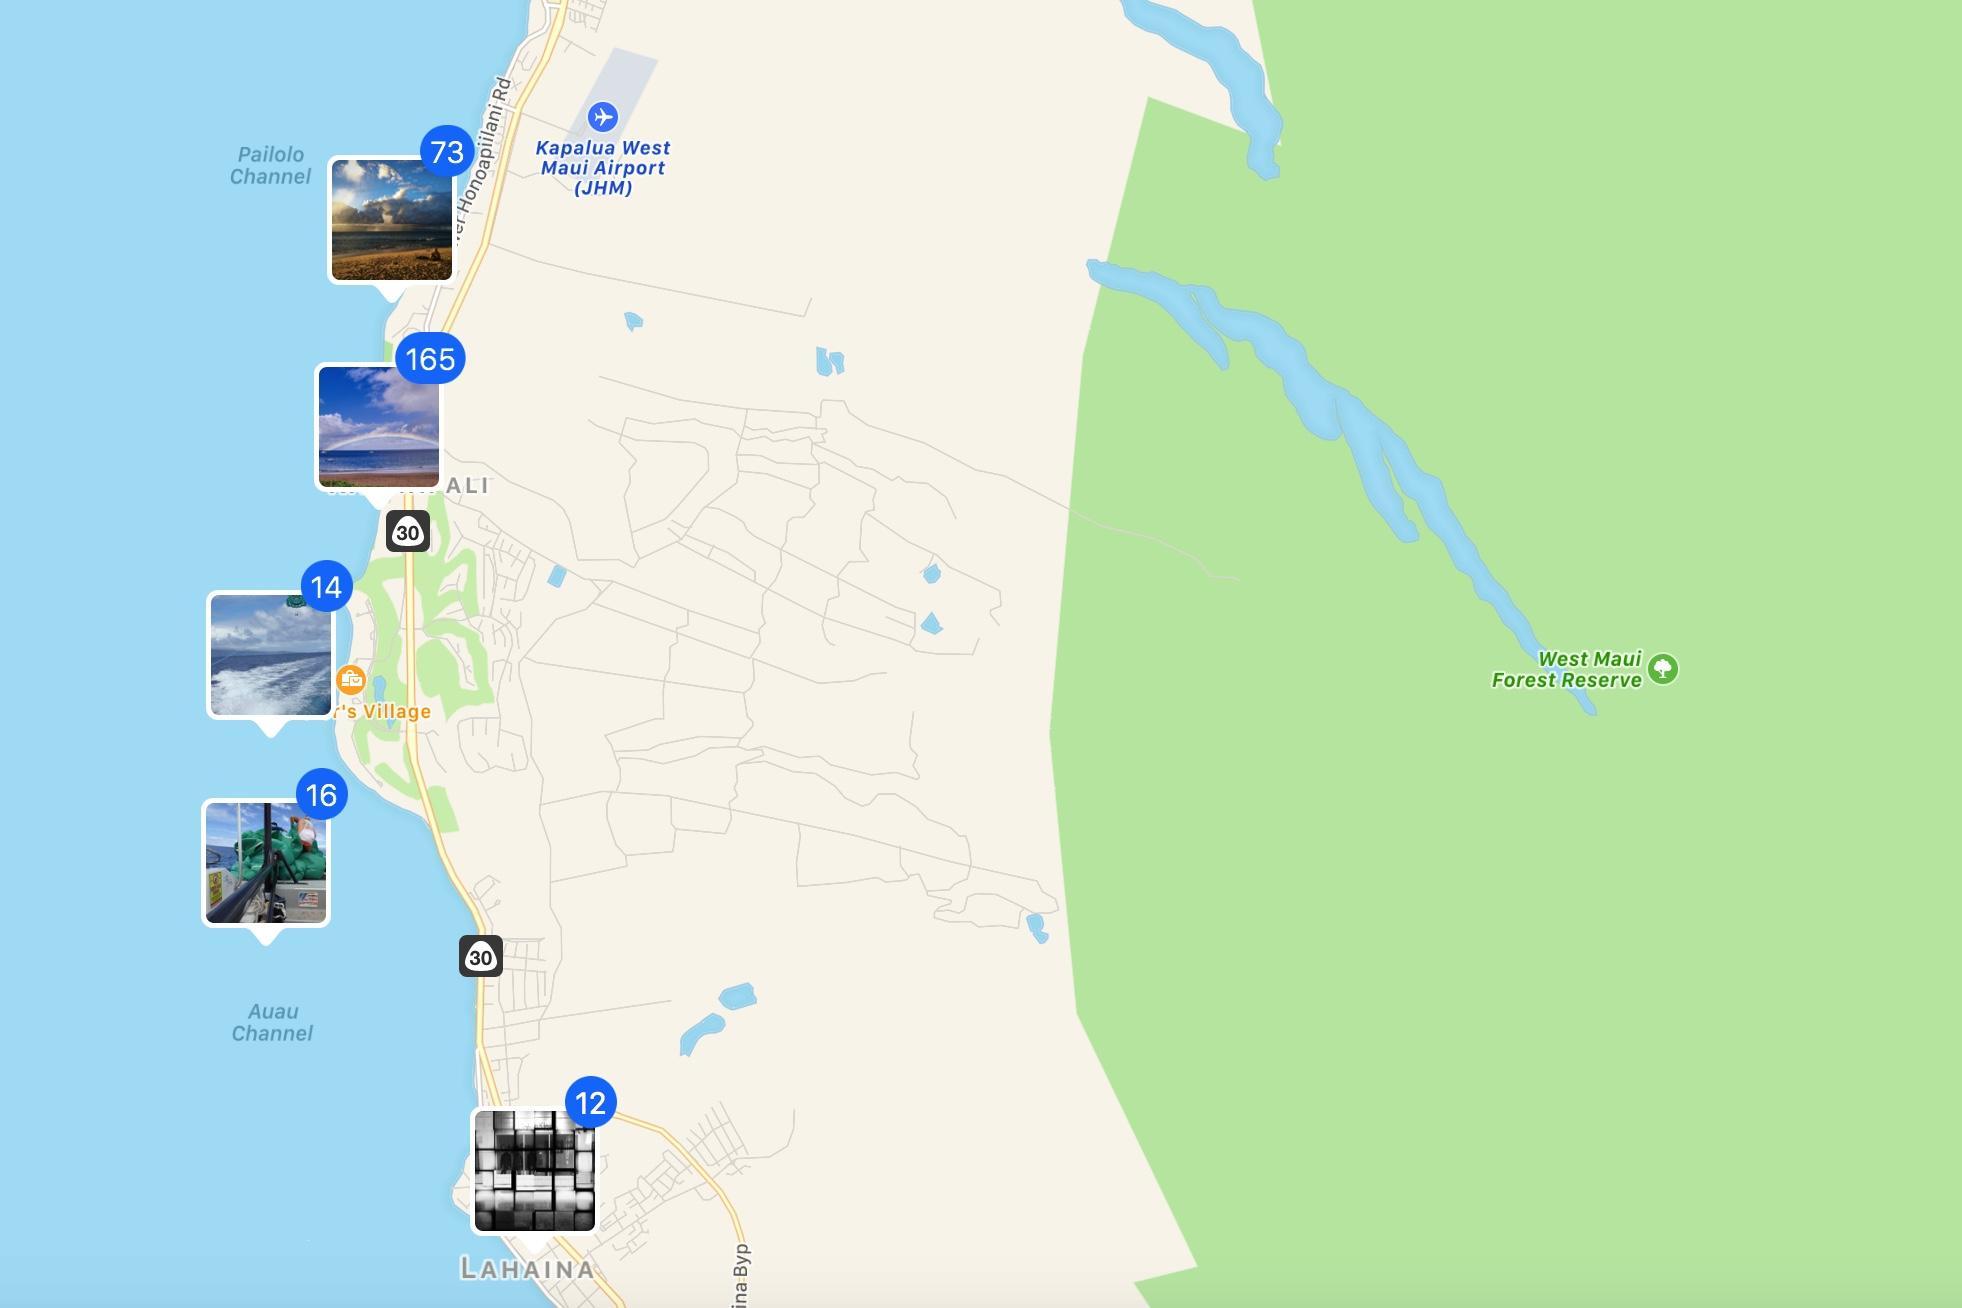 http://thedigitalstory.com/2016/09/30/island-locations.jpg